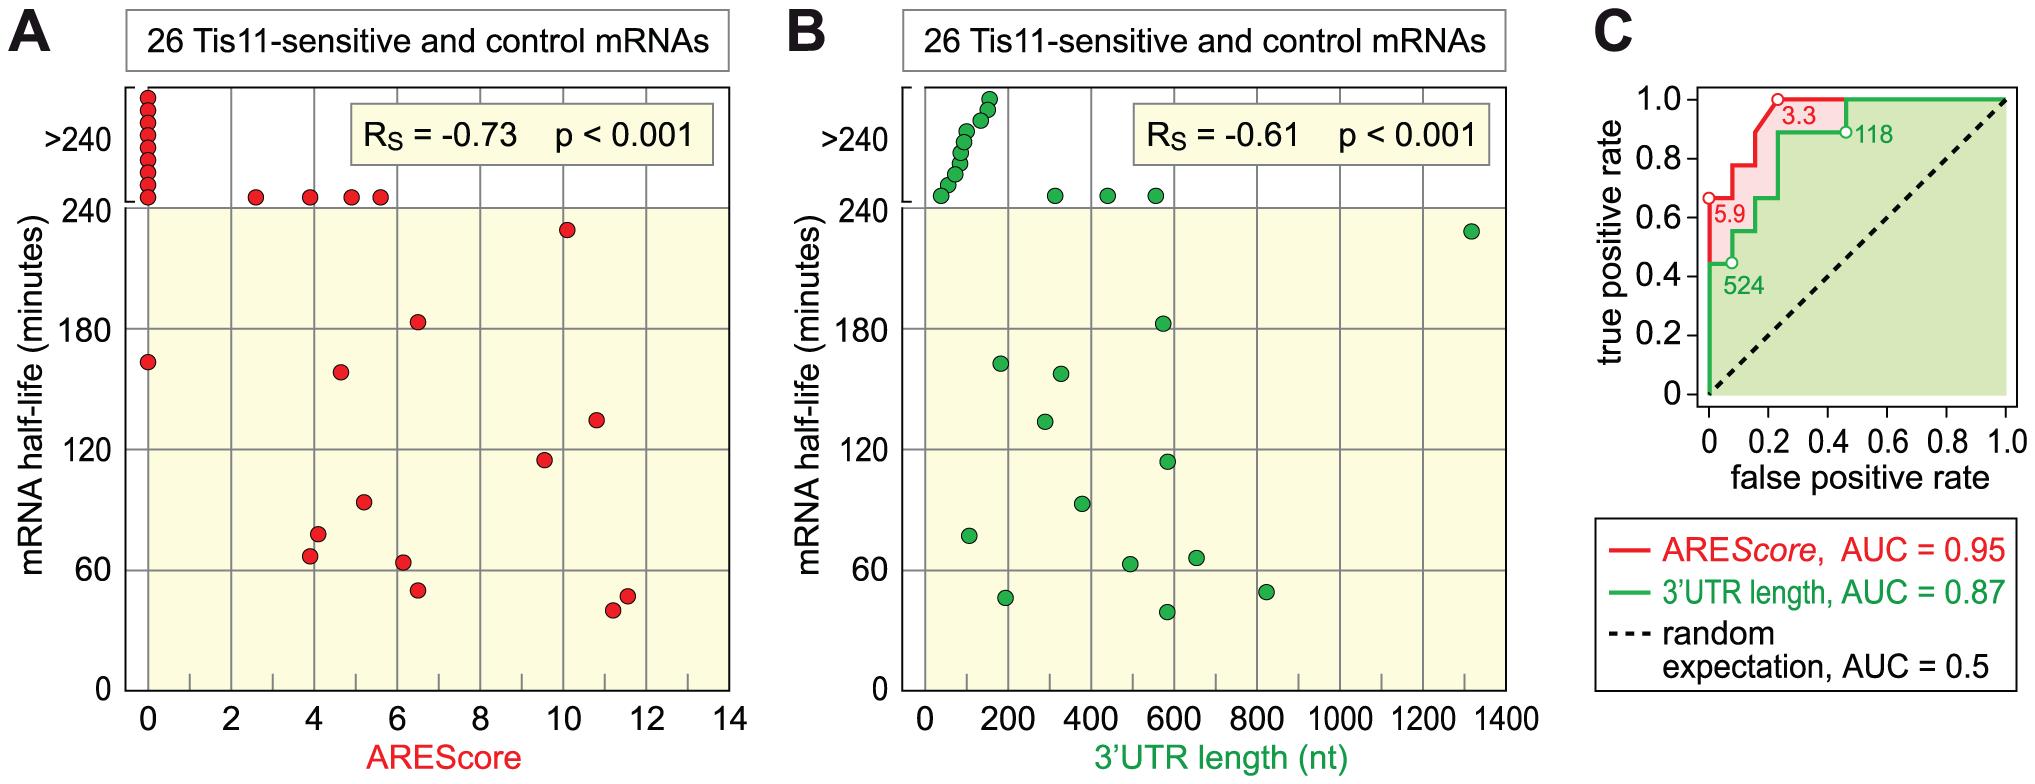 Relationship among ARE<i>Score</i>, 3′UTR length, and mRNA half-lives.